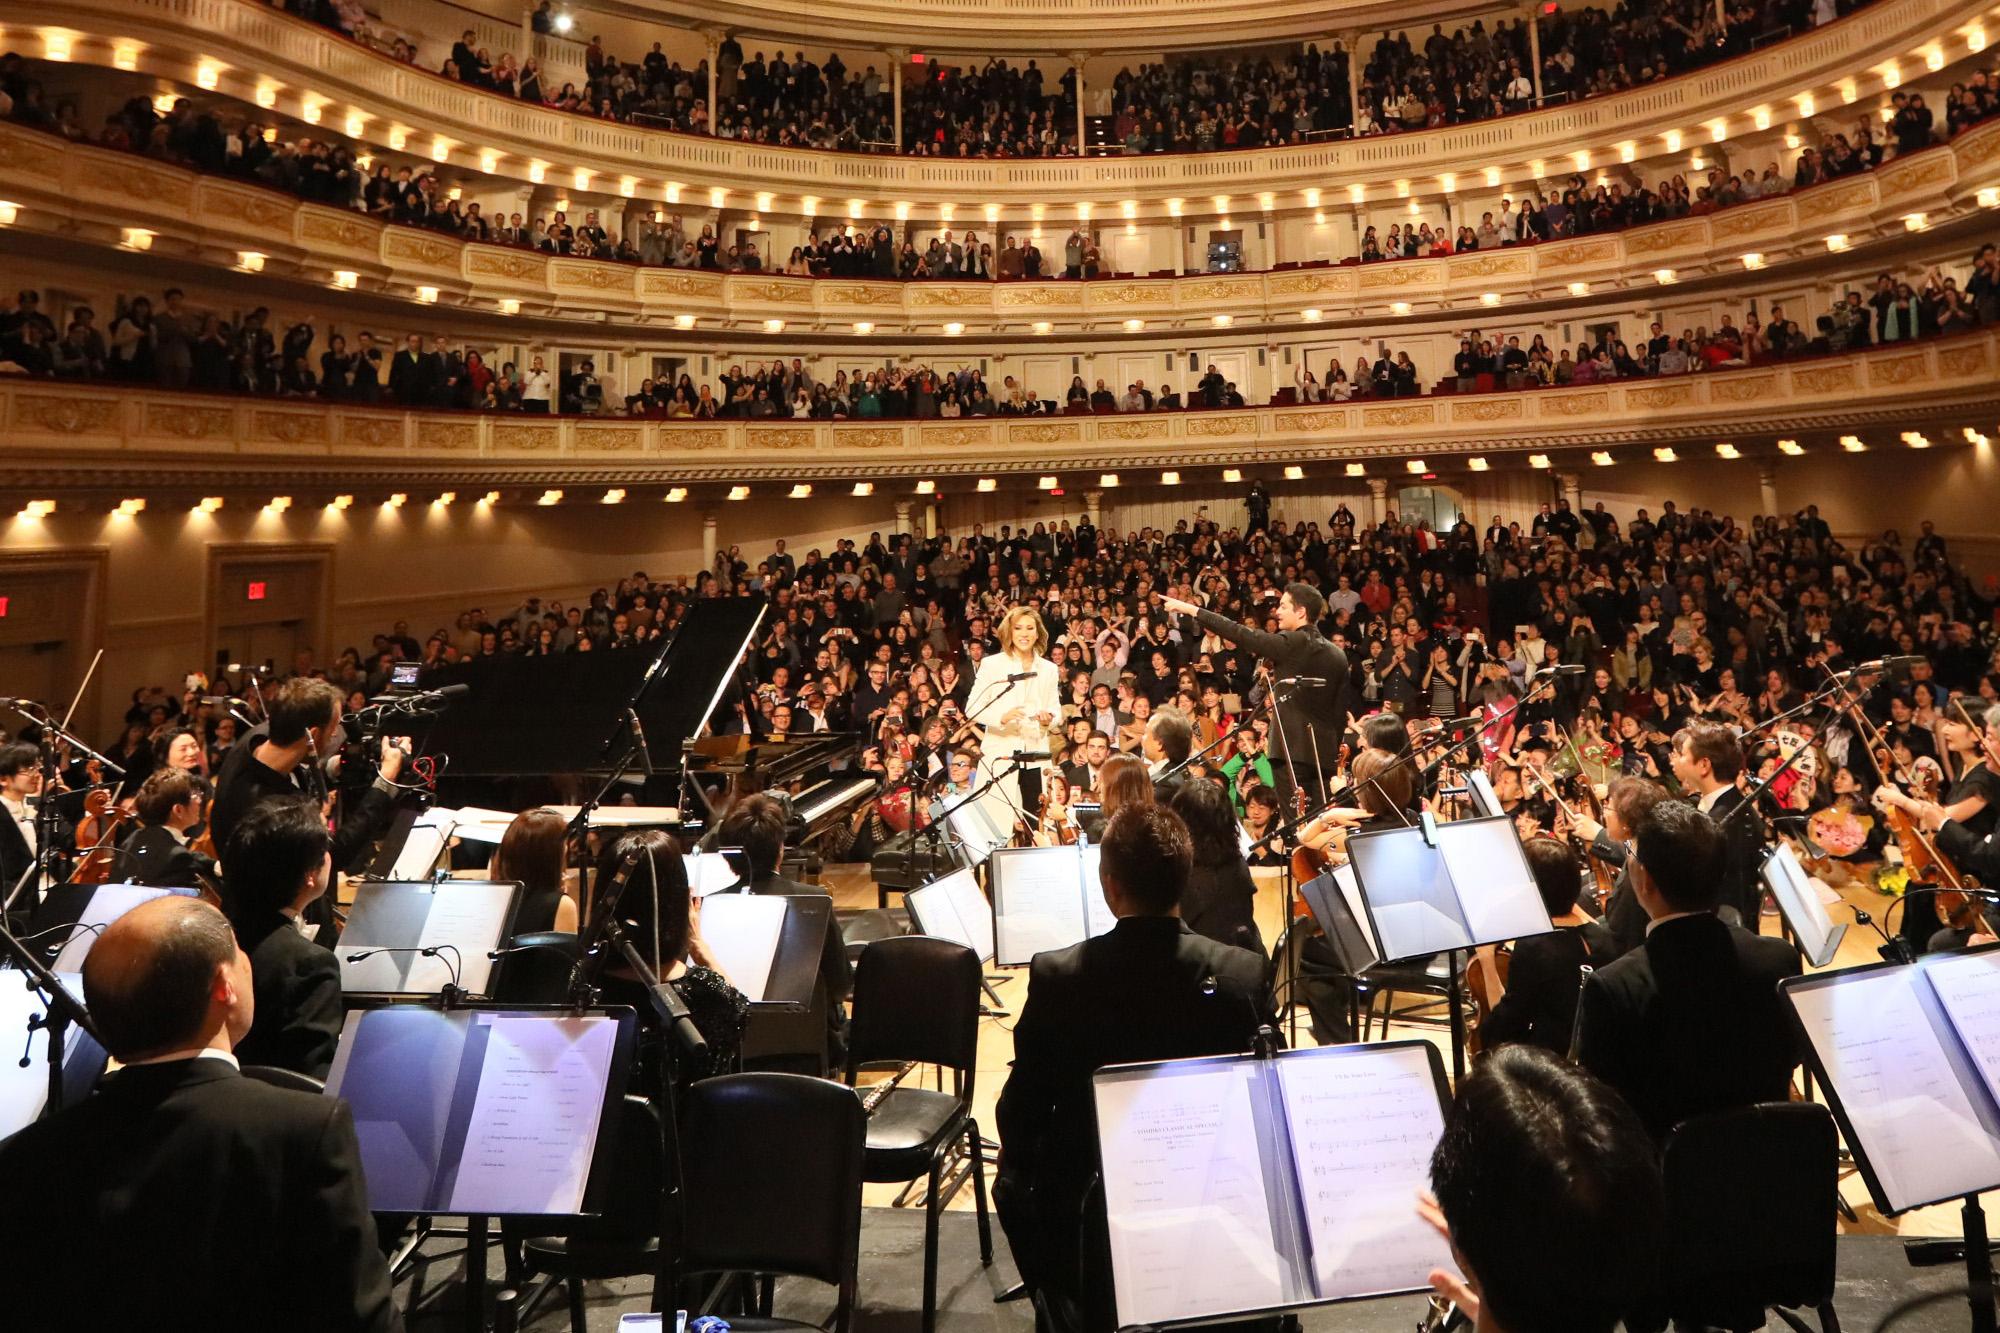 JRock247-Yoshiki-Classical-Carnegie-Hall-K0816cr